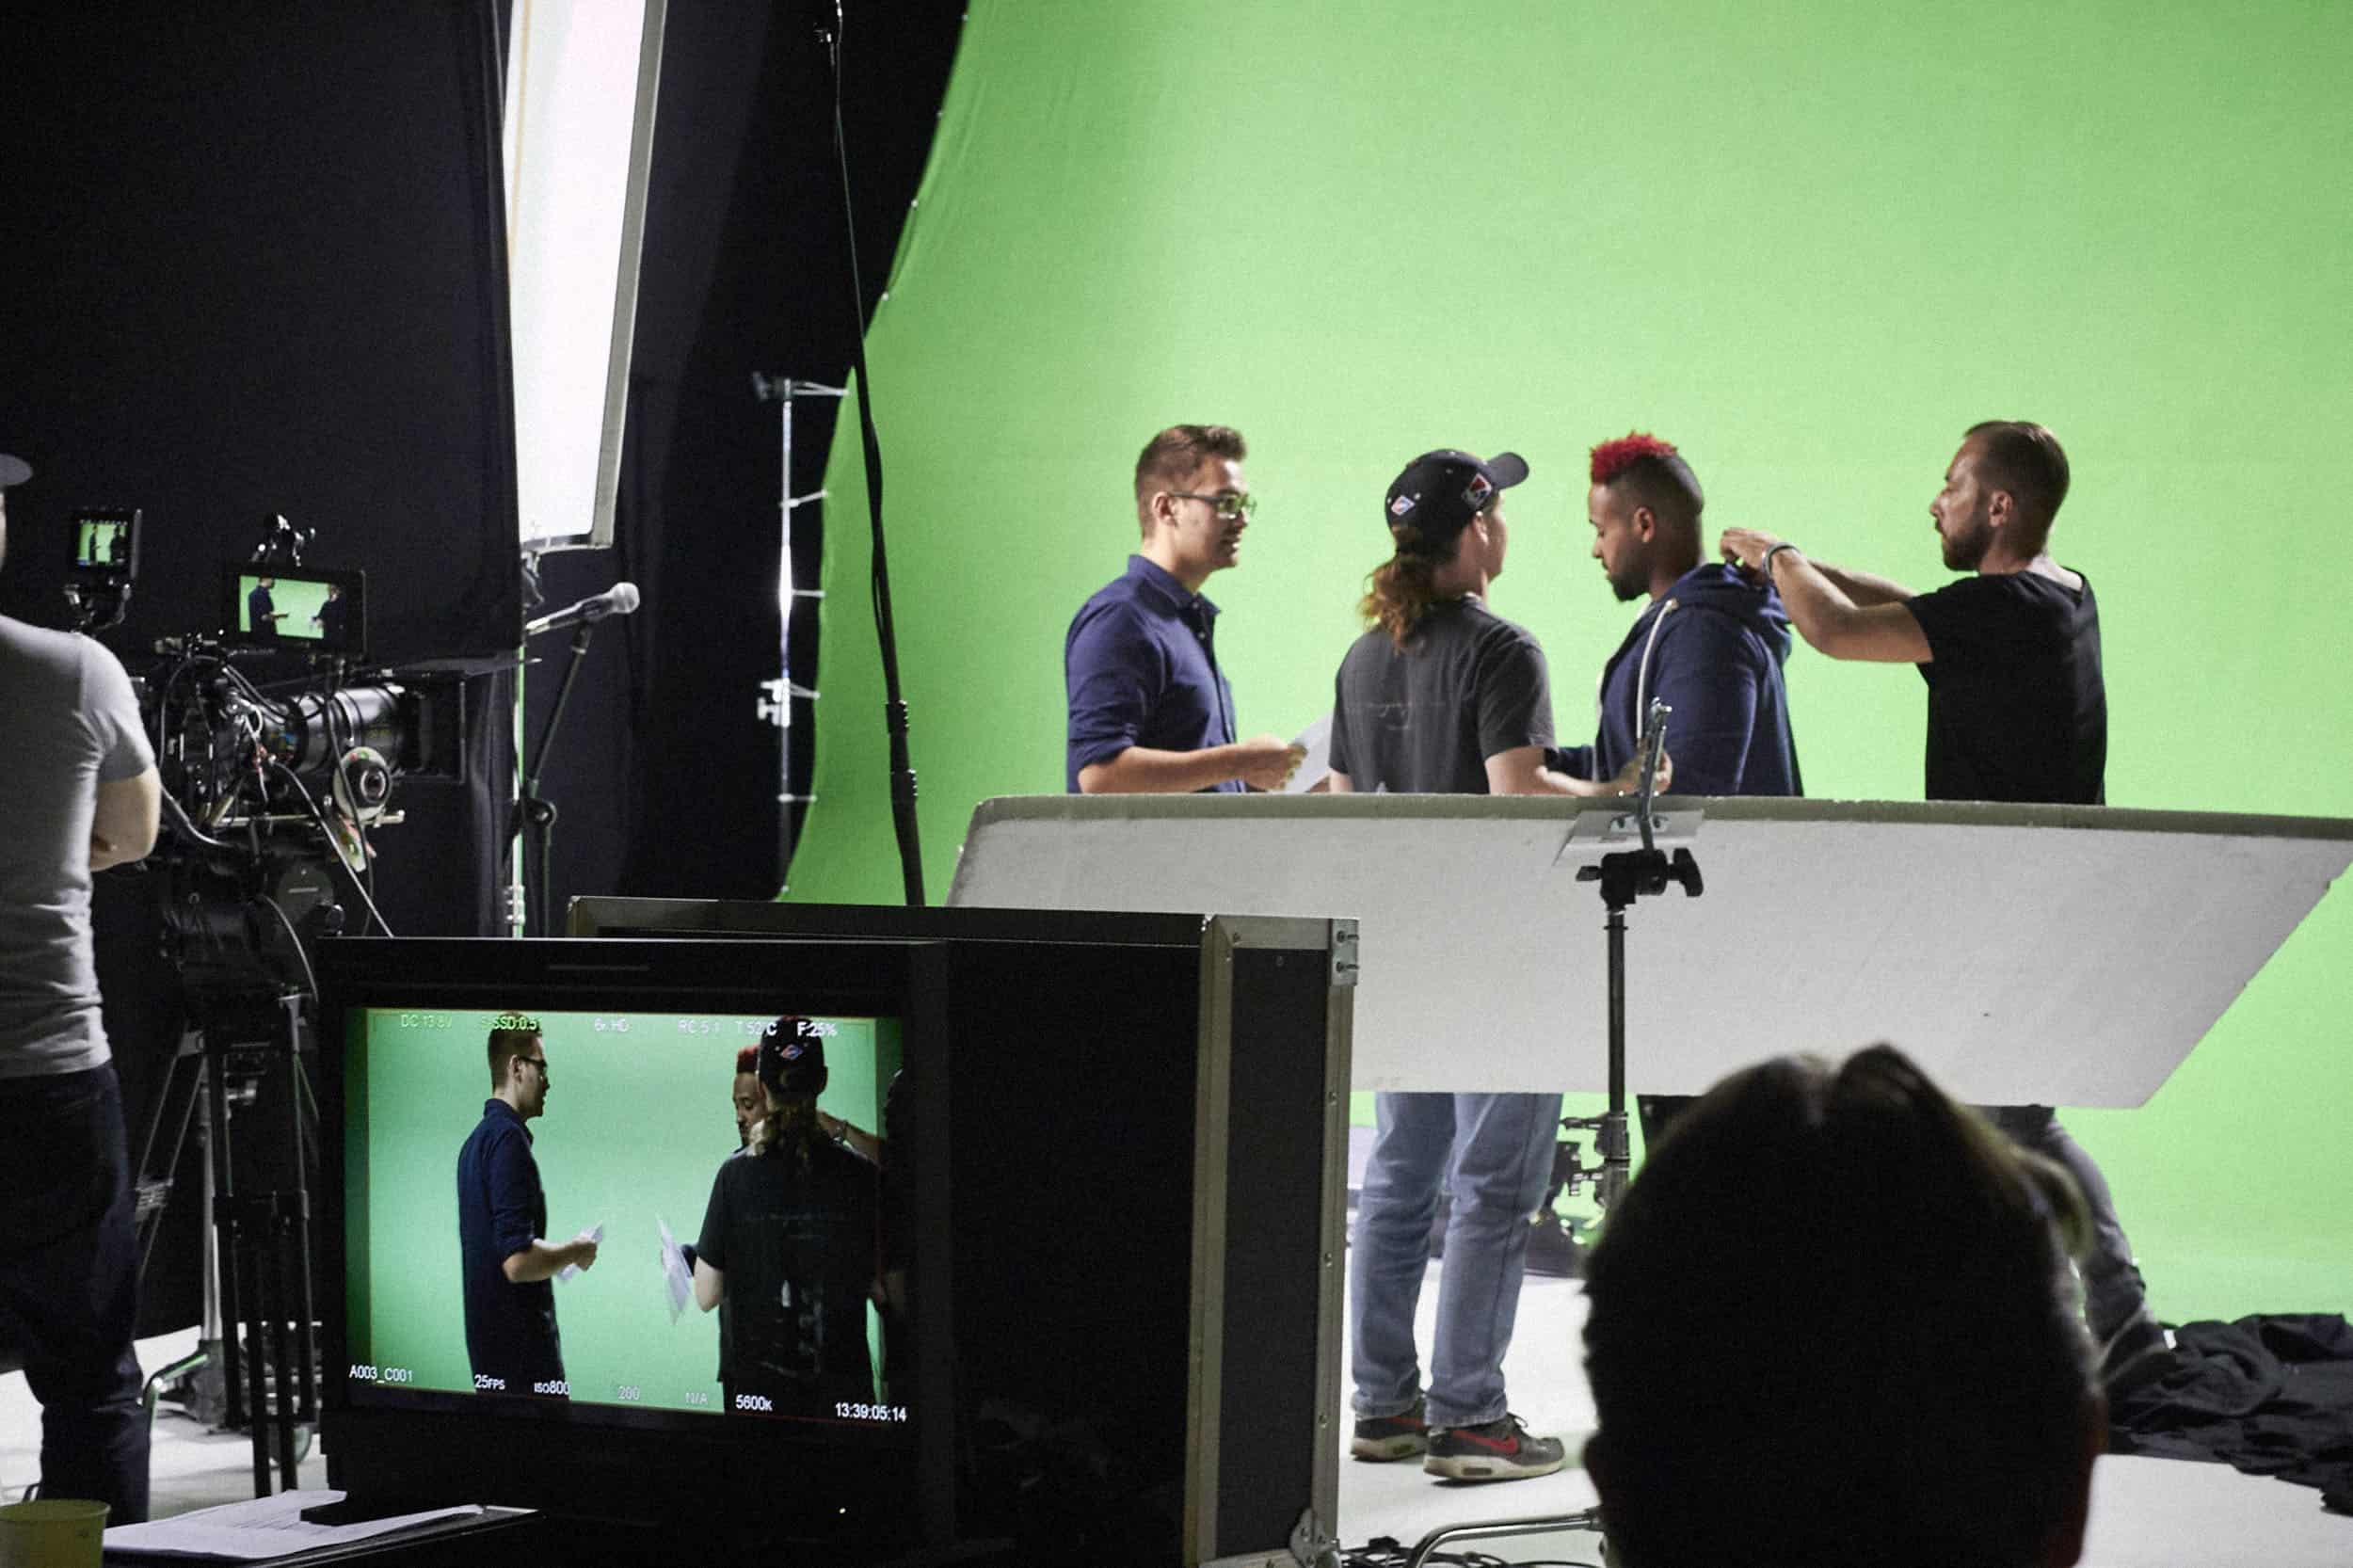 studio-ignatov-rolandversicherung-adokojo-tvcommercial-08